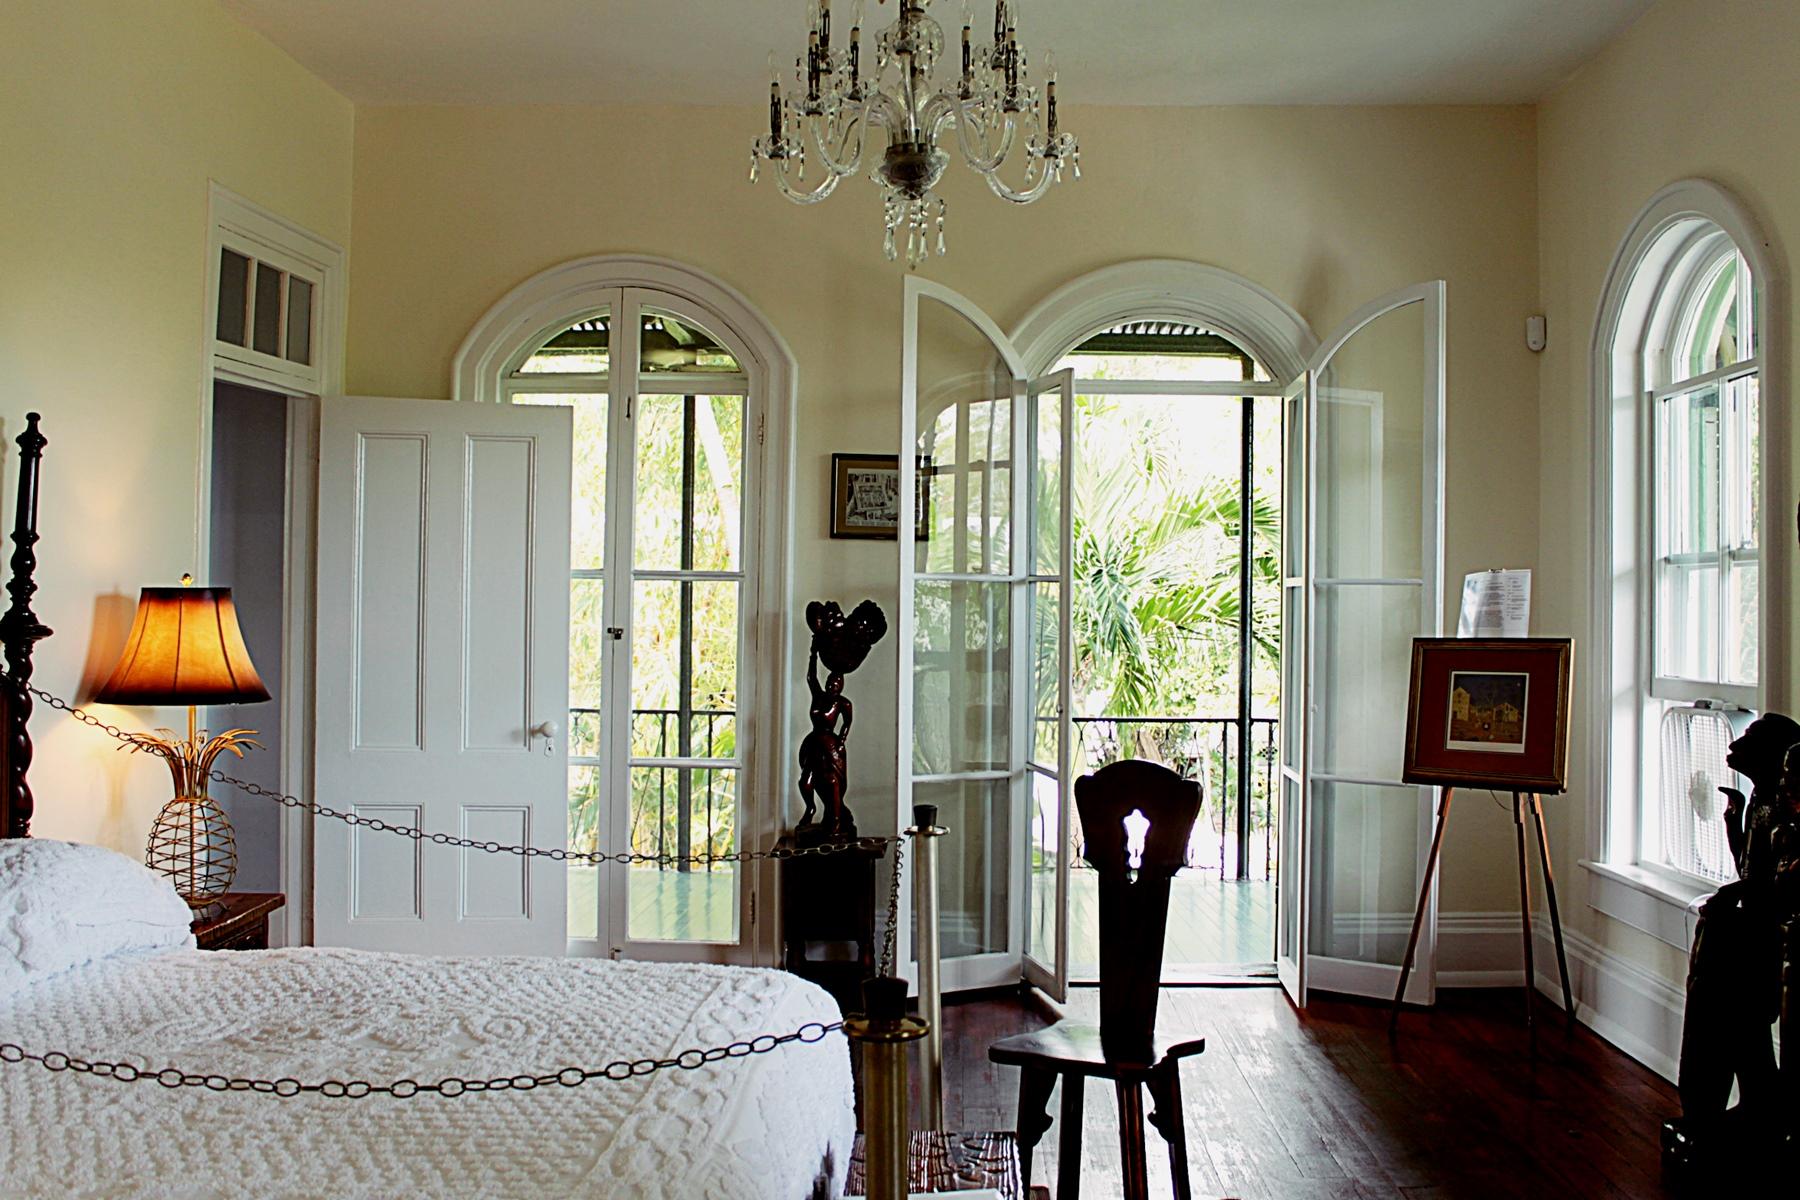 ernest hemingway bedroom